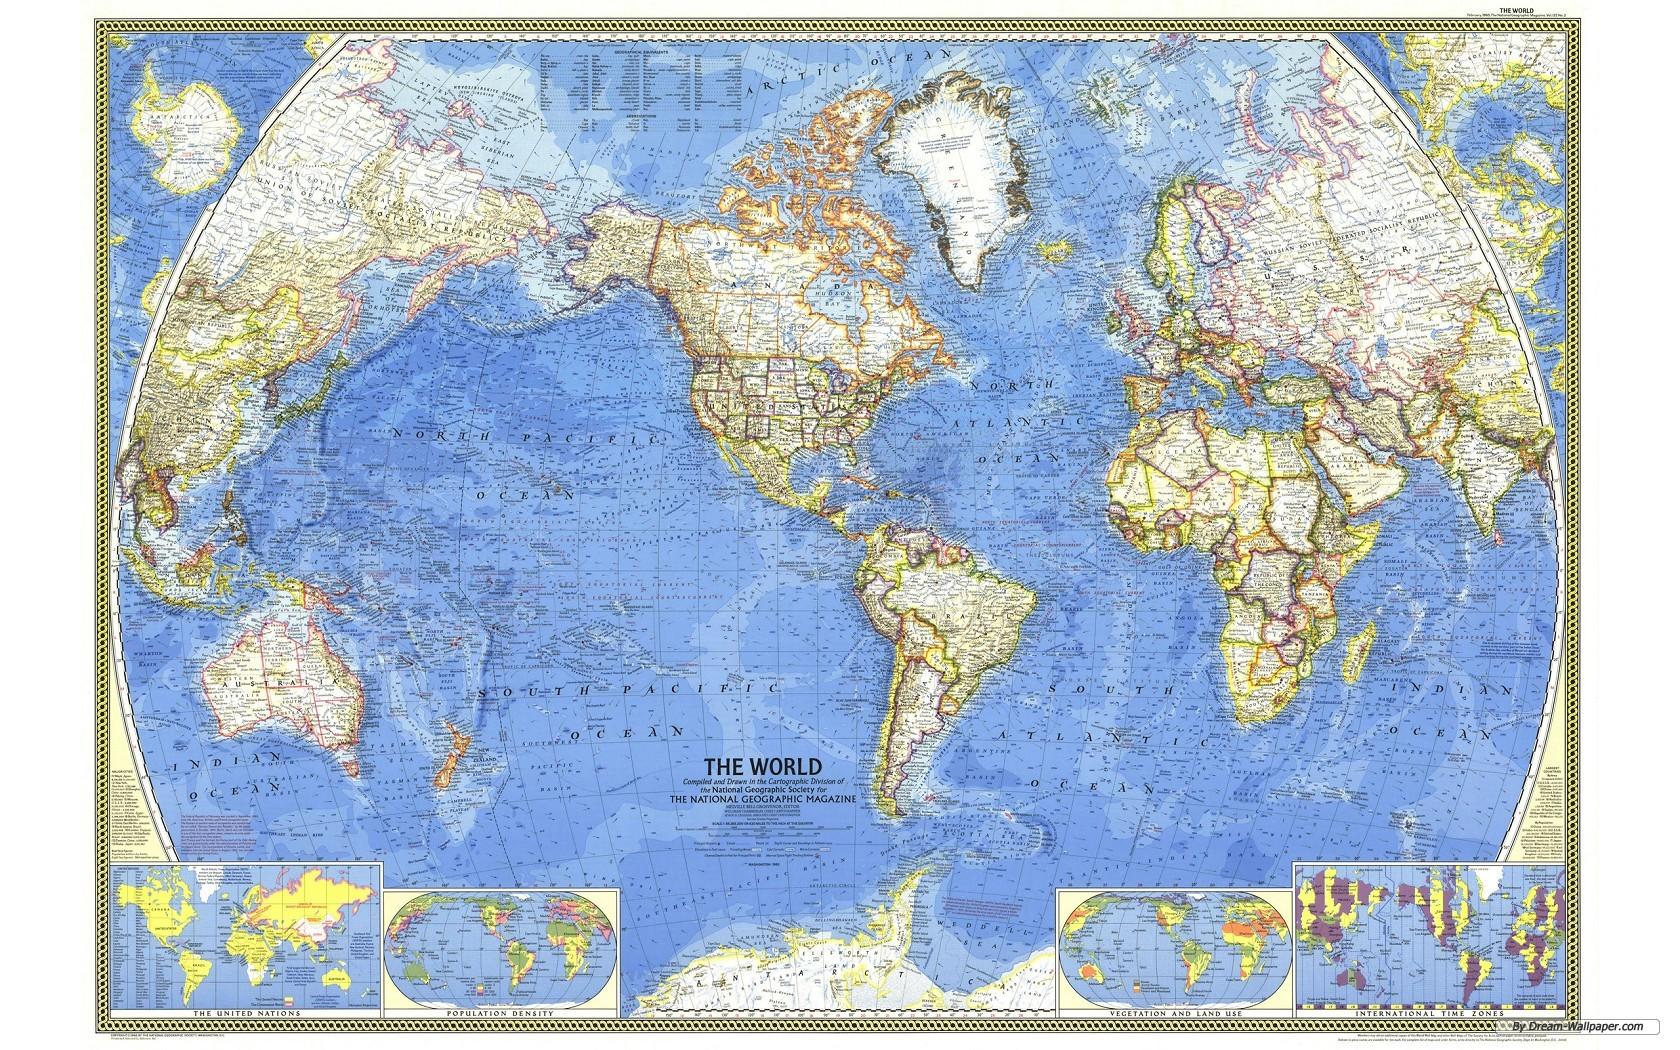 World map wallpaper desktop wallpapersafari wallpaper world map wallpaper 1680x1050 wallpaper index 14 1680x1050 gumiabroncs Image collections